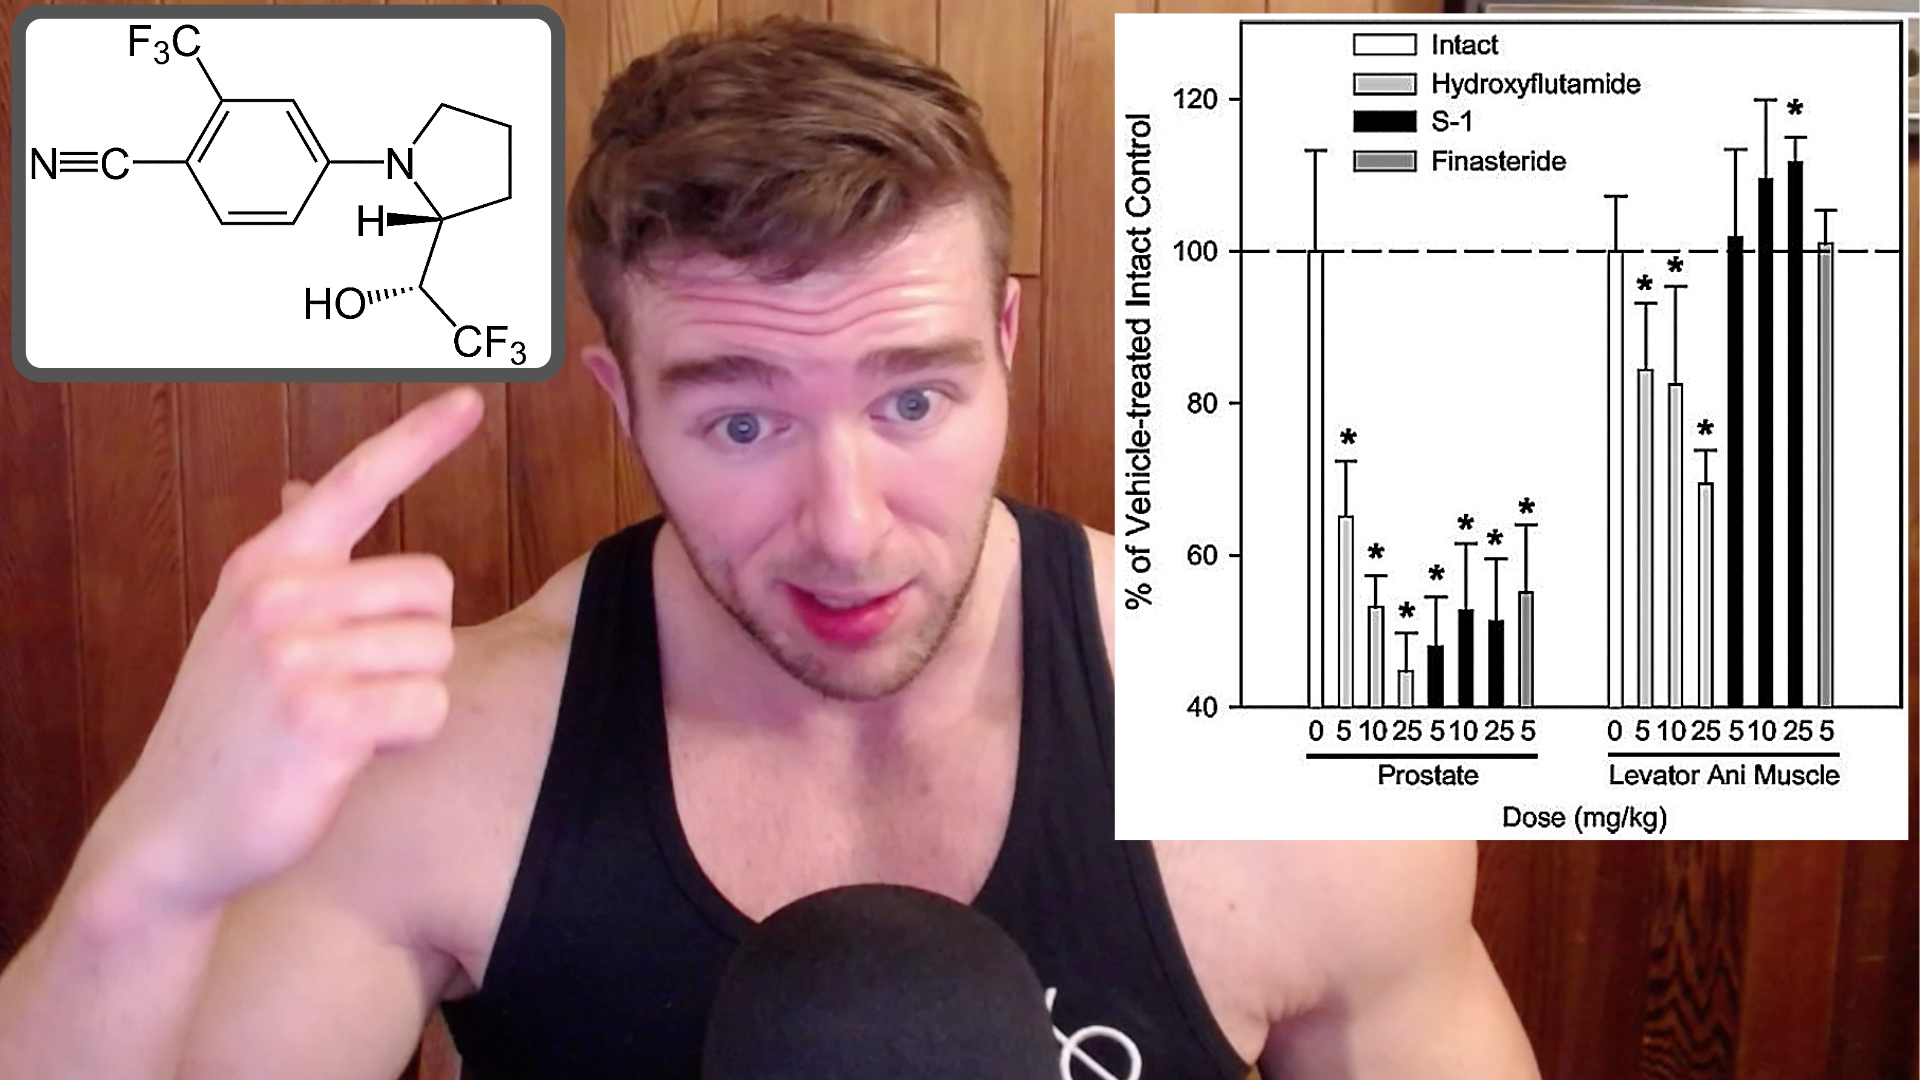 Do SARMs Cause Hair Loss? - Do SARMs Prevent Hair Loss? (Thumbnail)